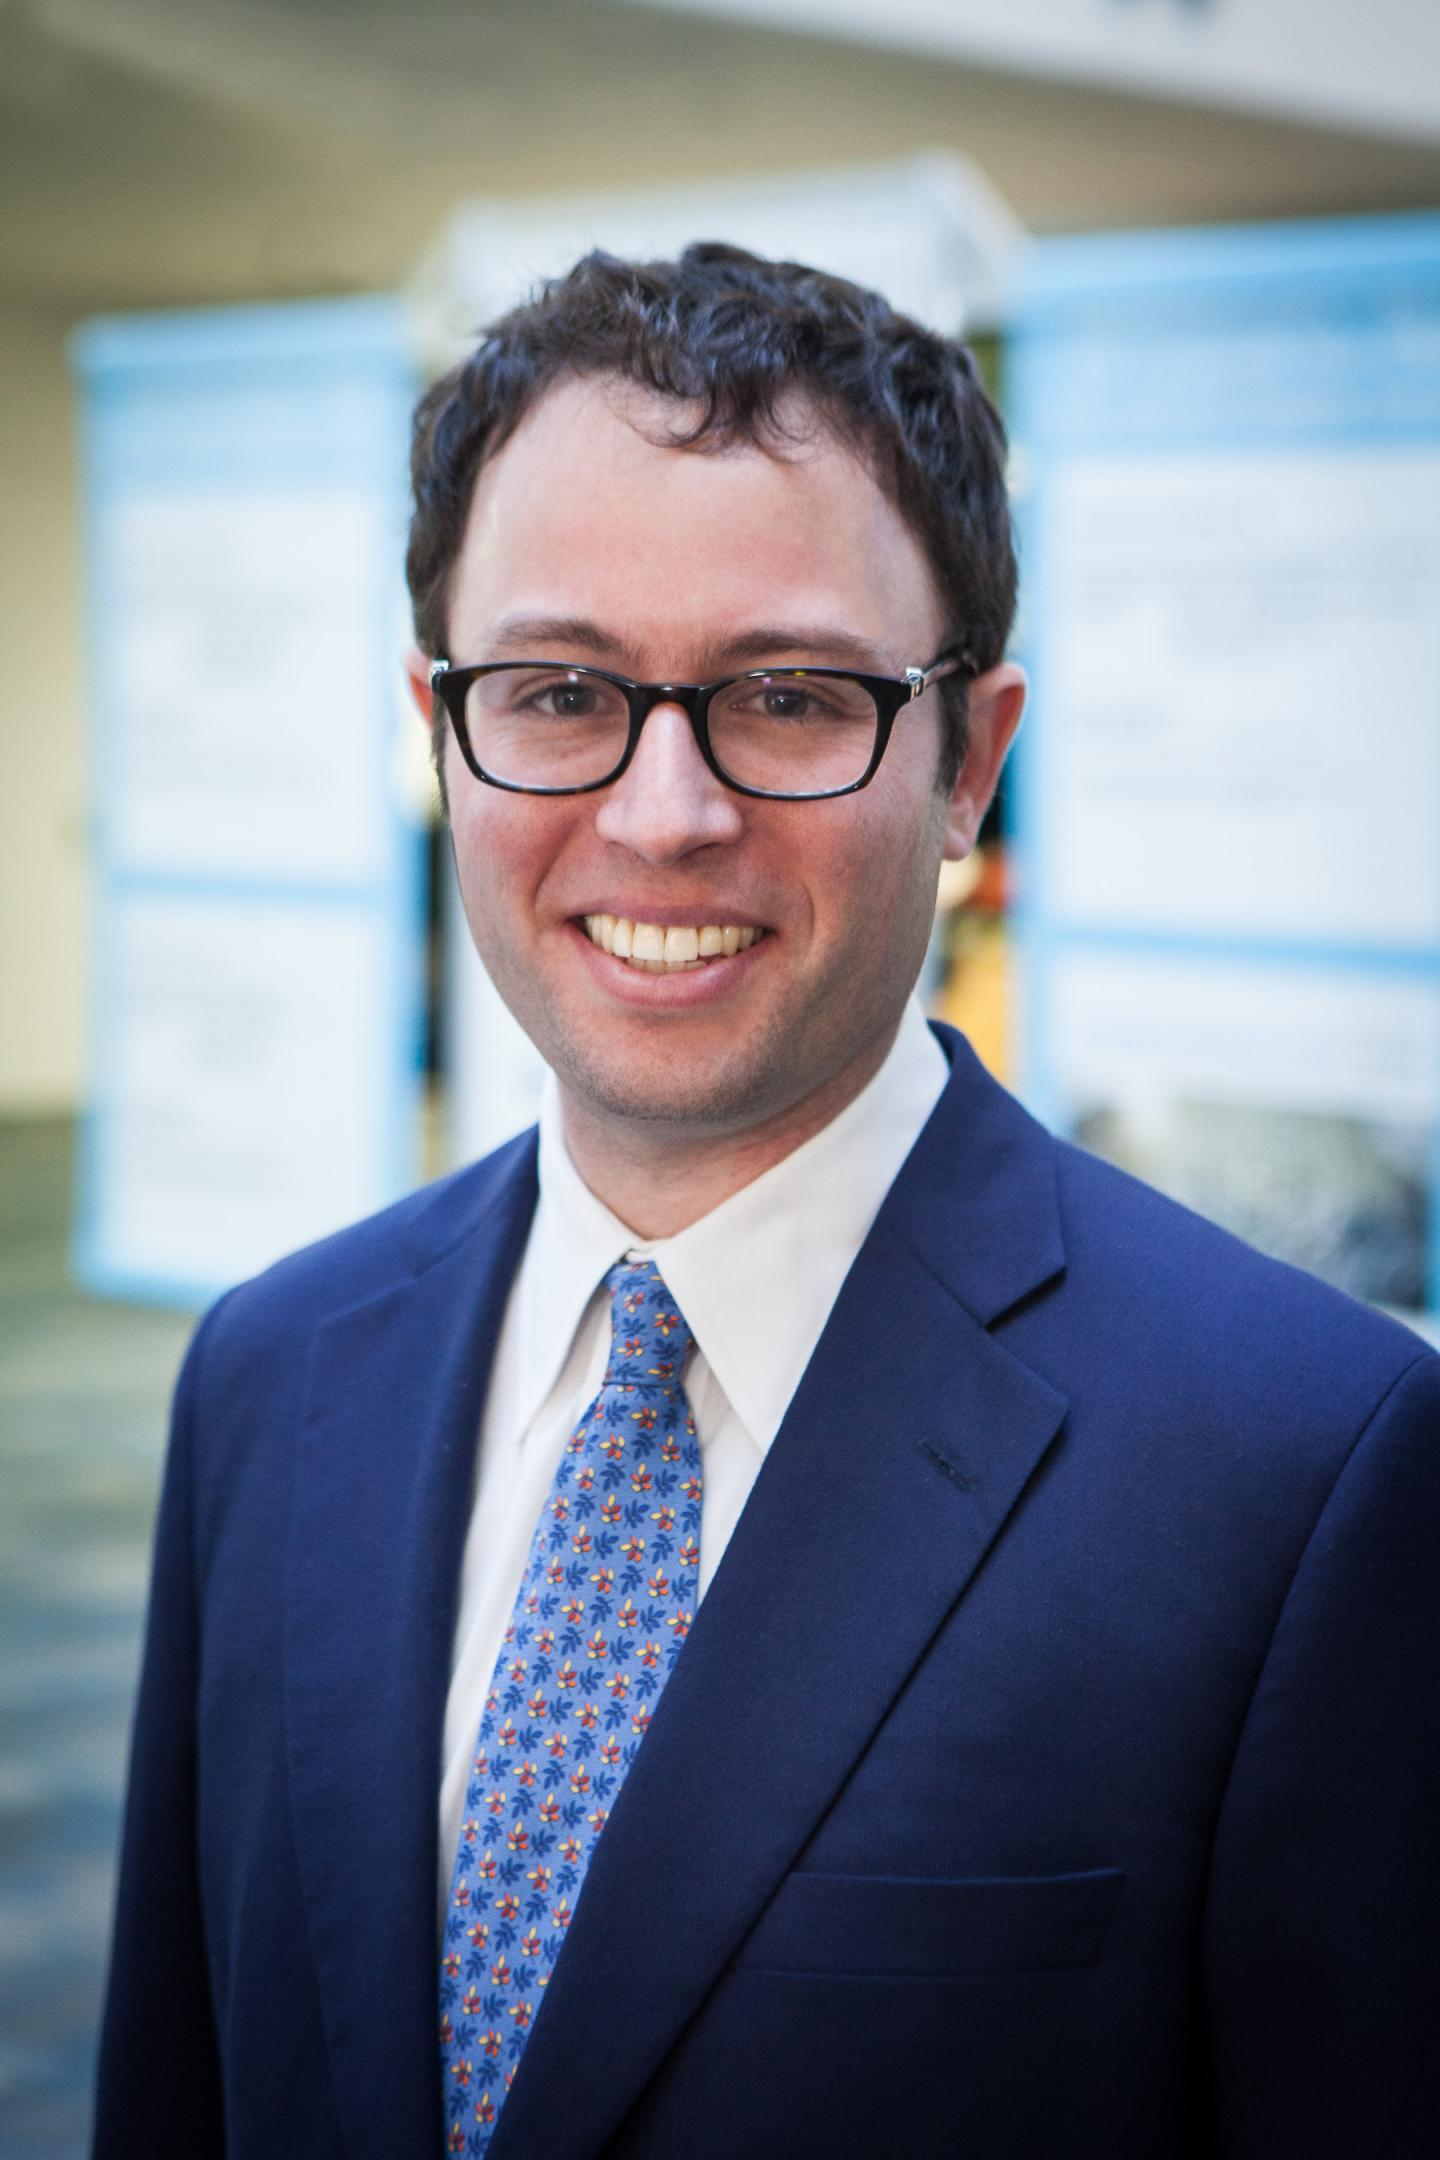 Mark Neuman, University of Pennsylvania School of Medicine